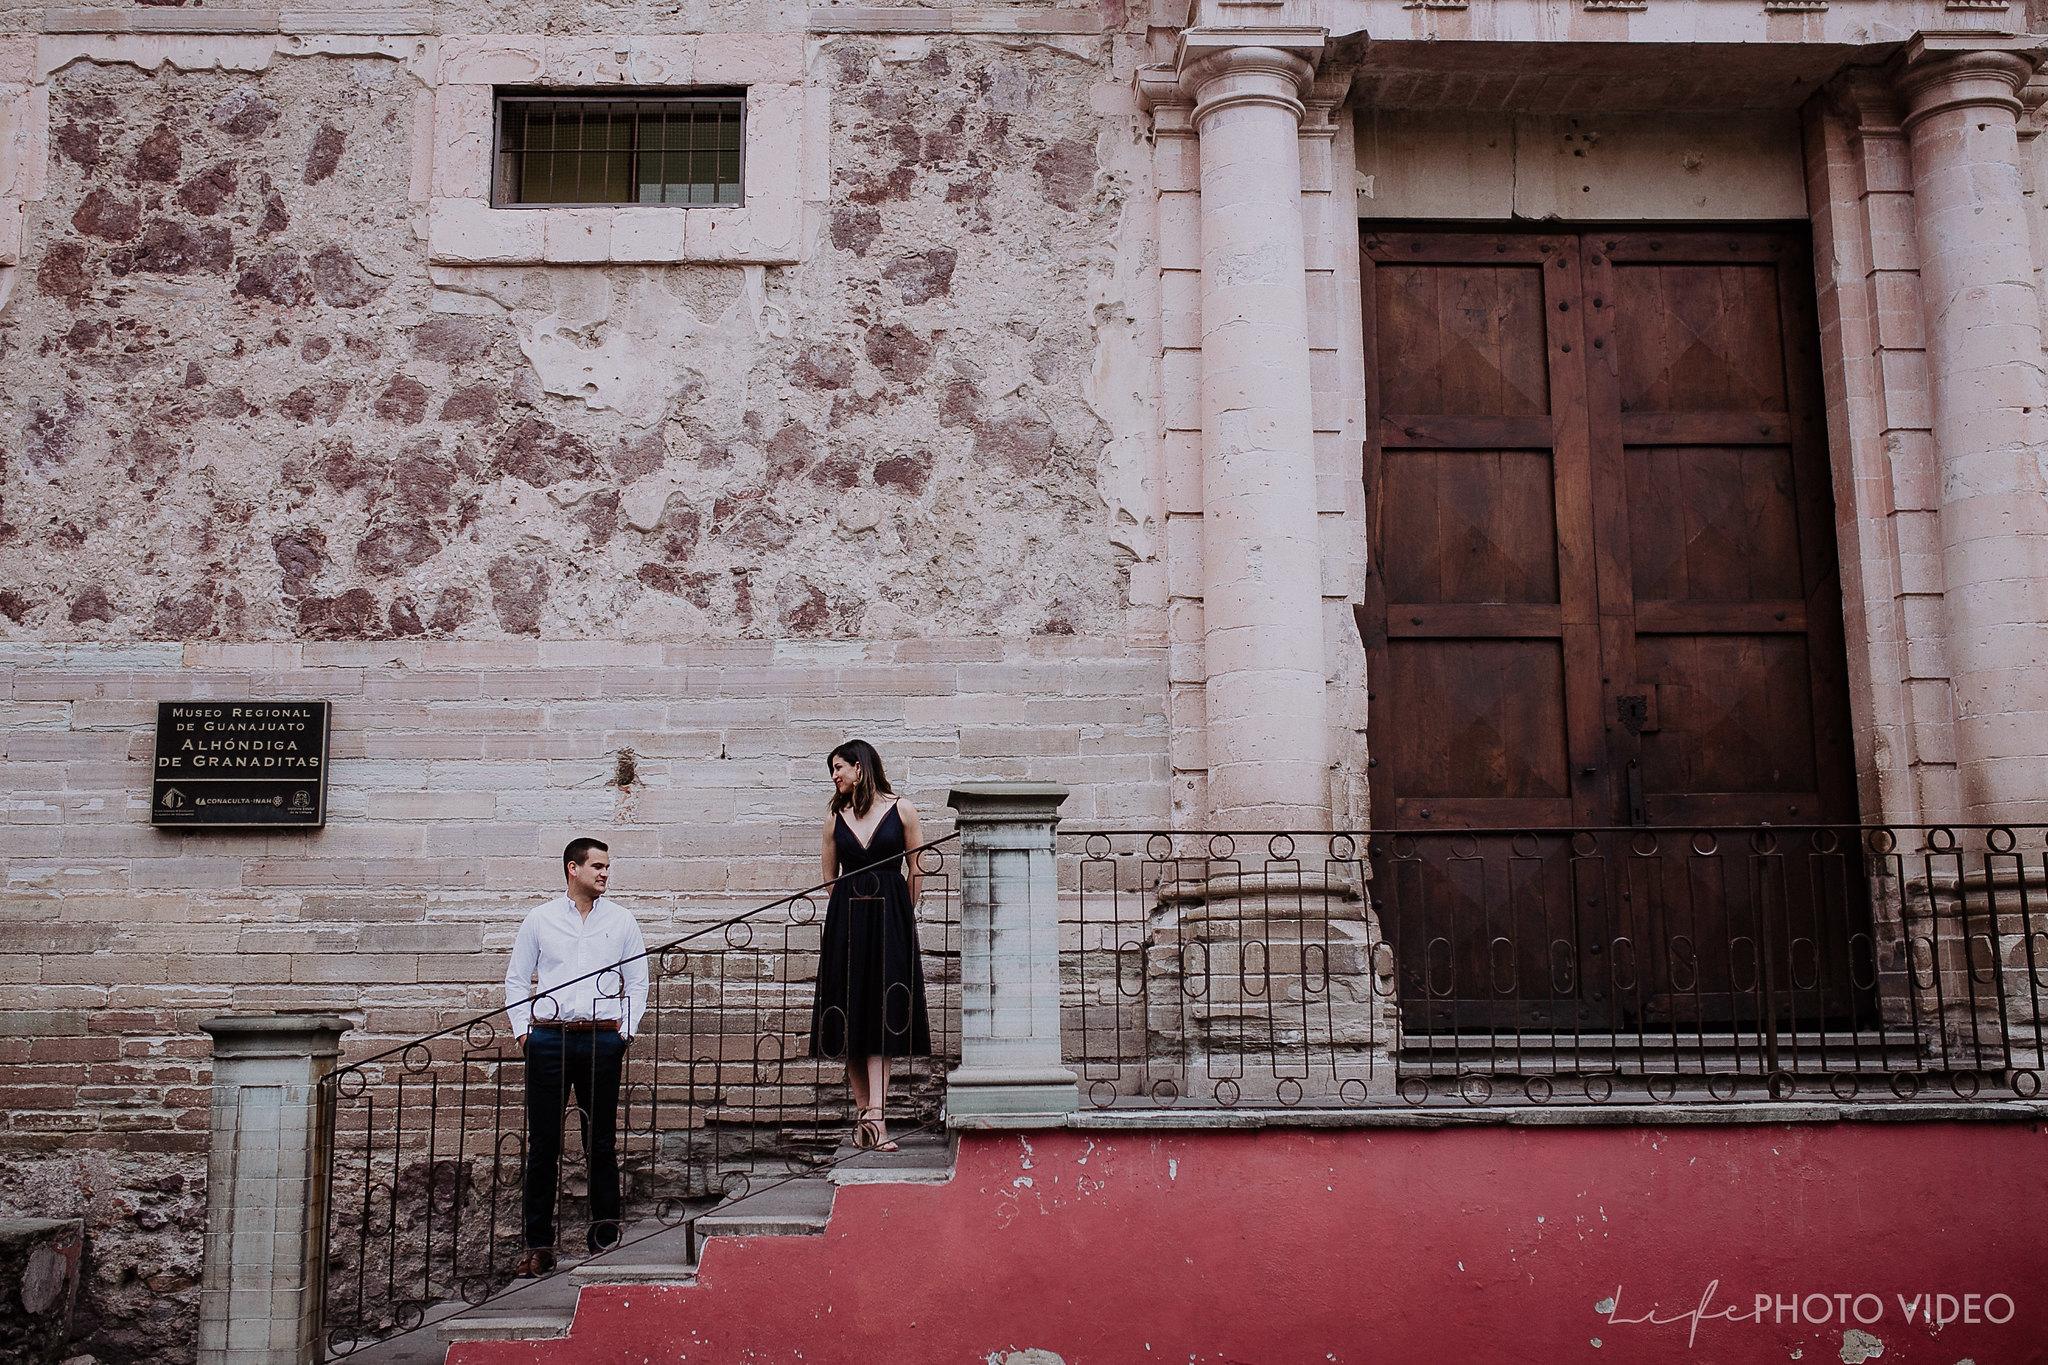 171217_Guanajuato_Photographer_0005